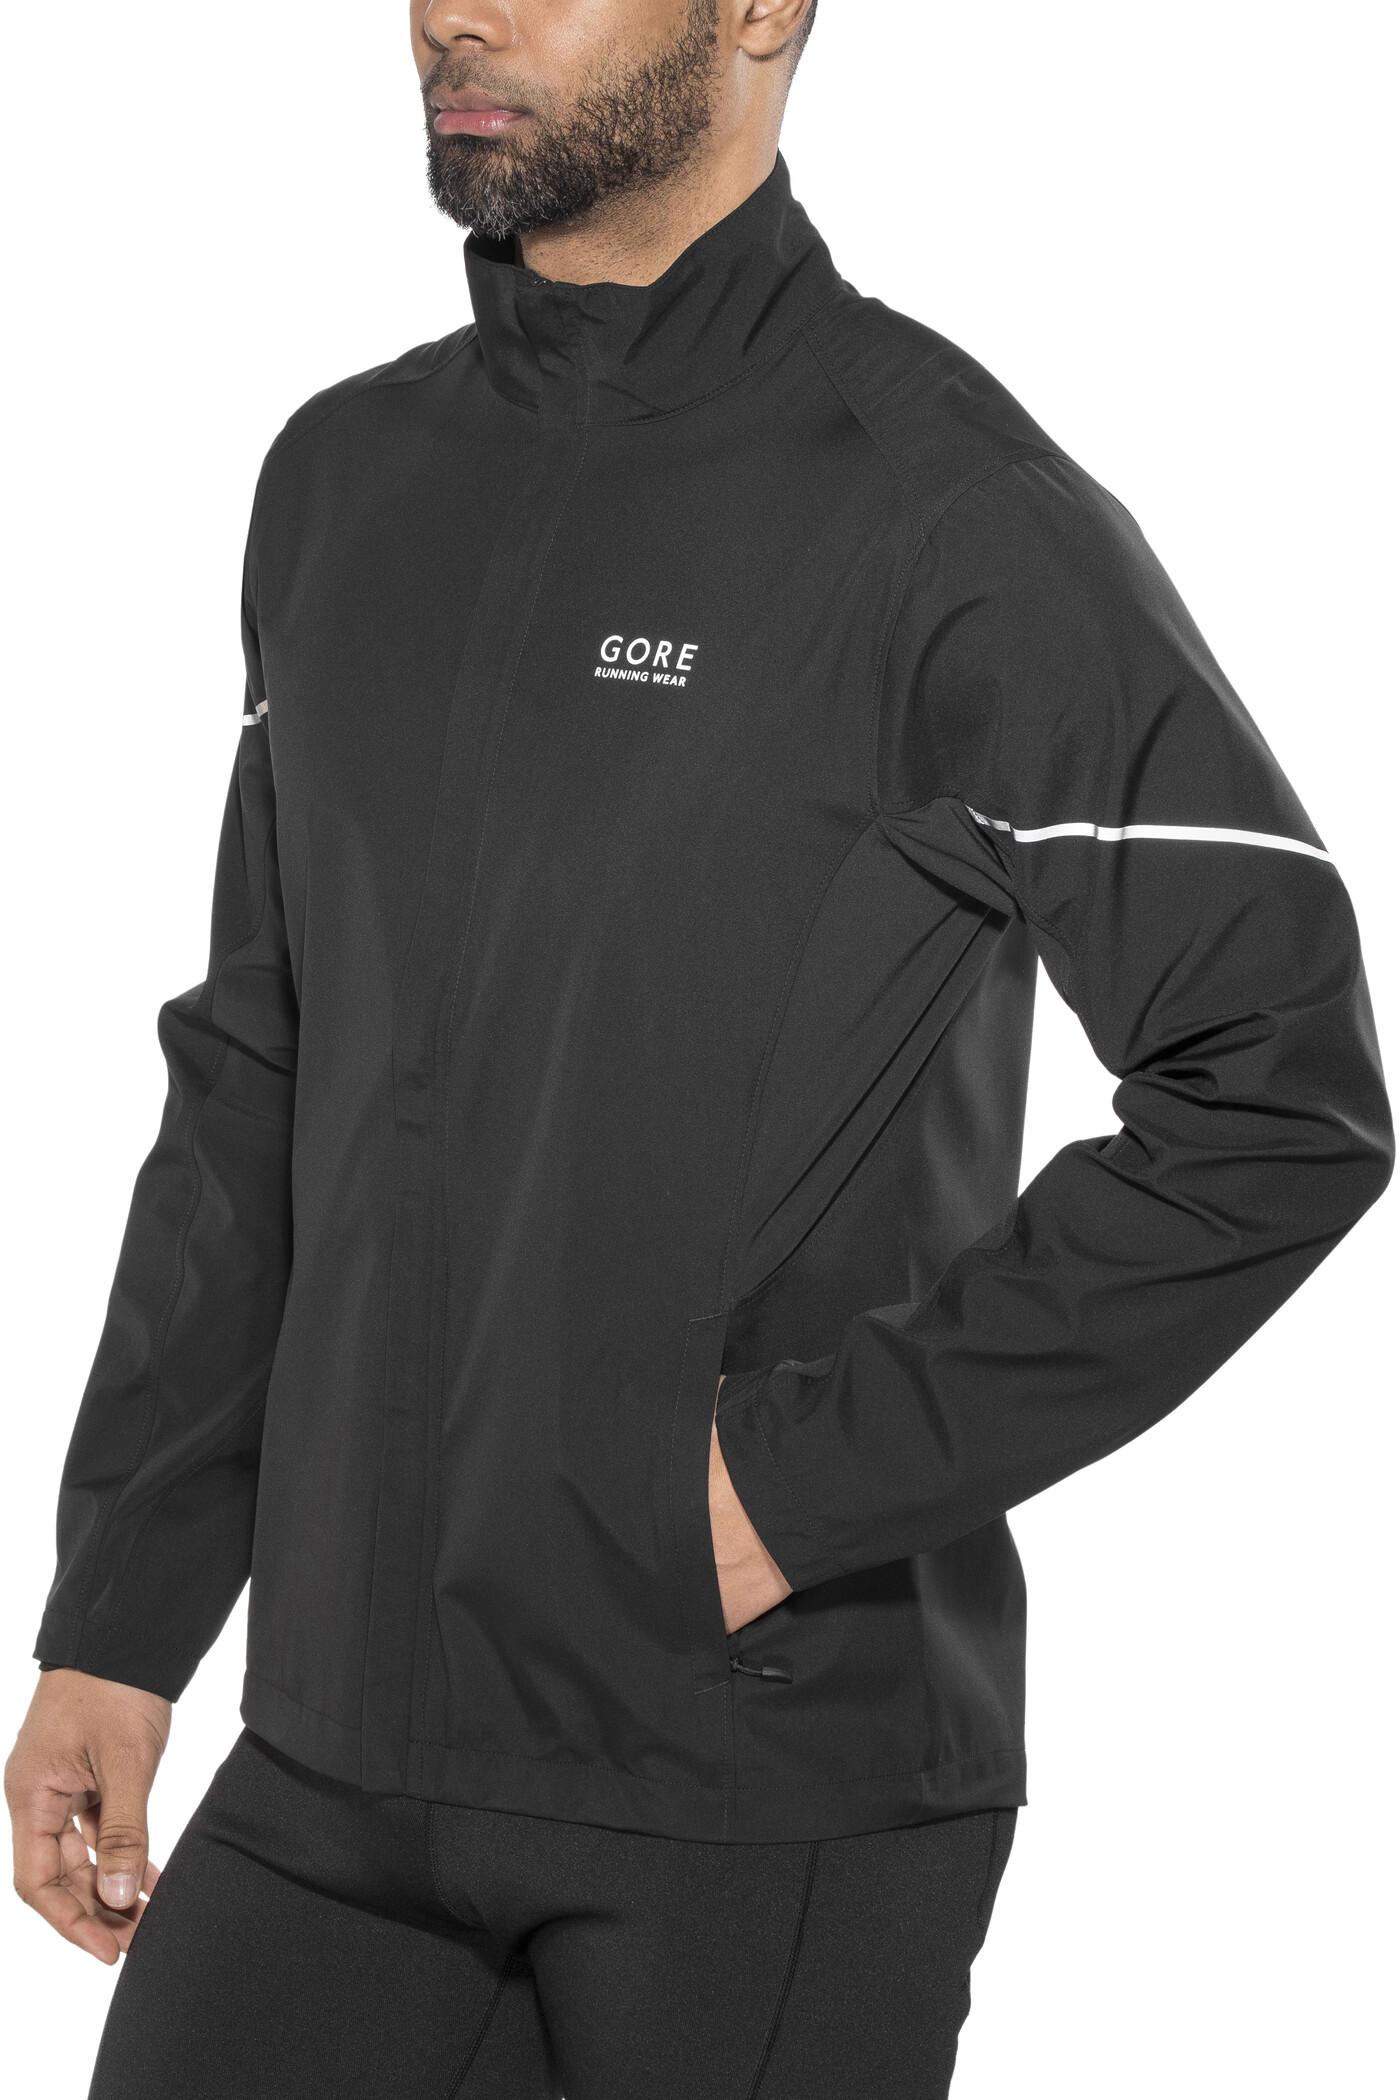 GORE RUNNING WEAR Essential WS Active Partial Jacket Men black.jpg dee4bf2905